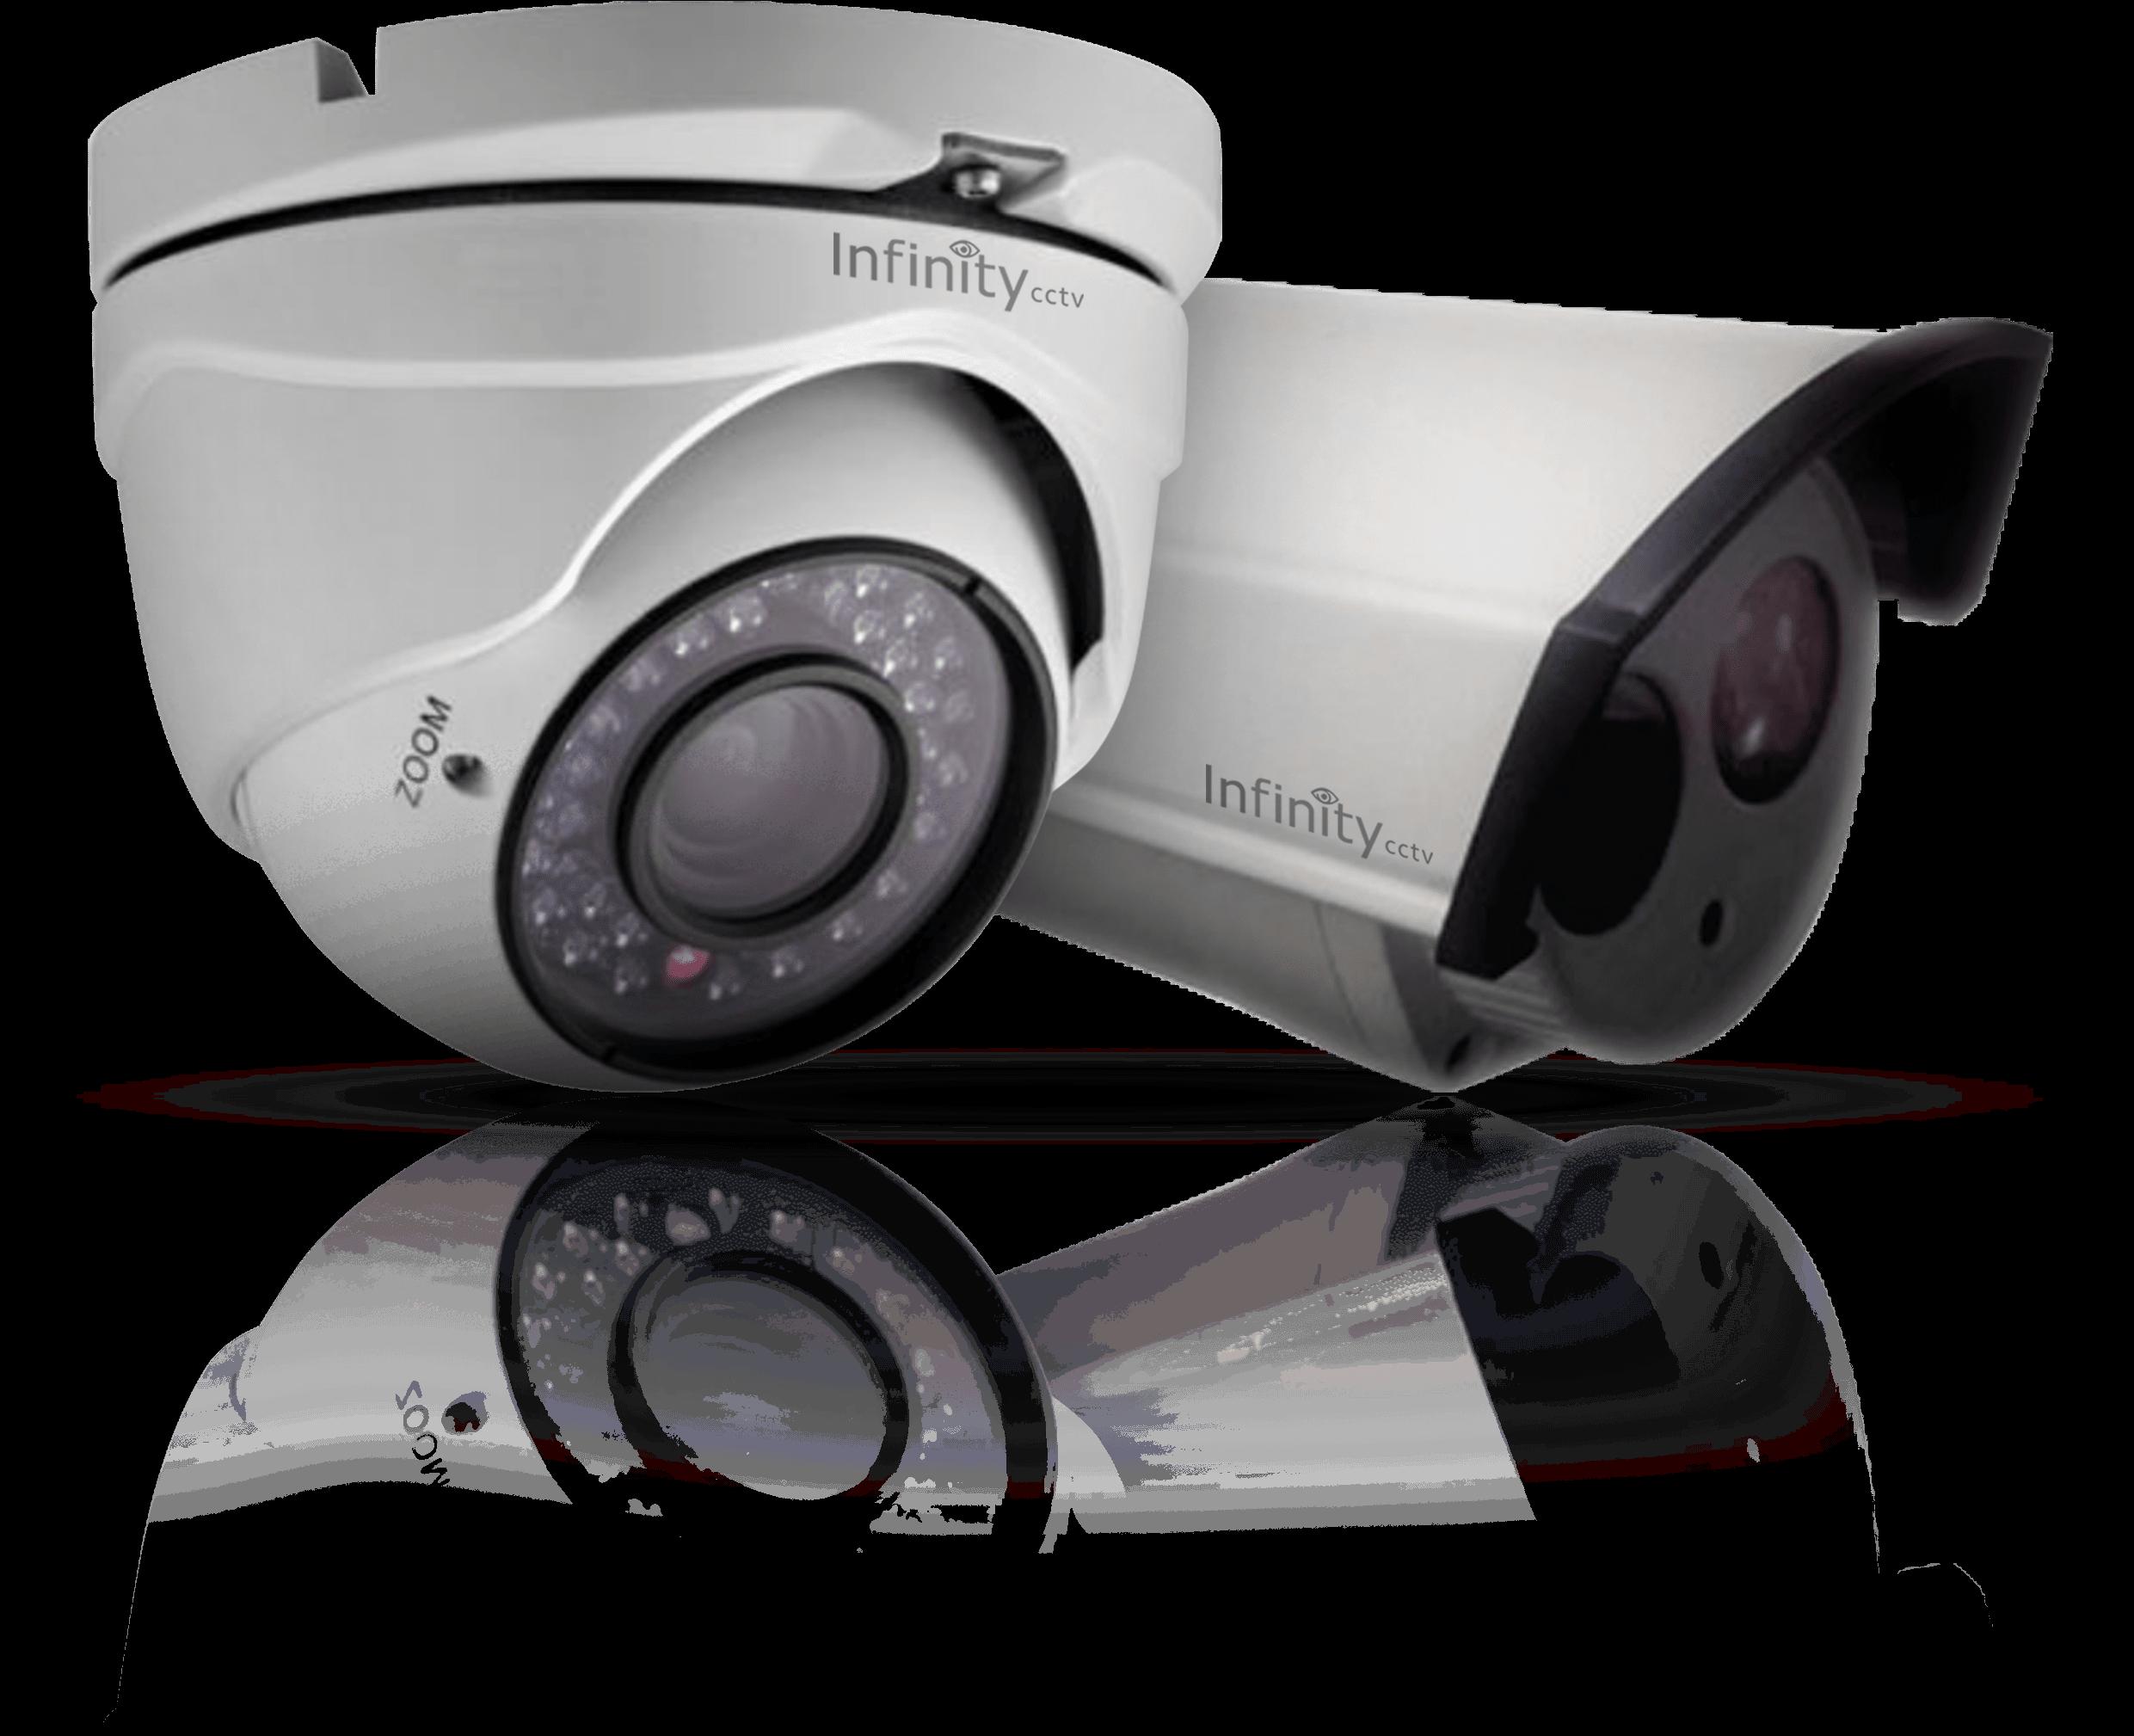 HD Hikvision Cctv Dome Cameras Transparent PNG Image Download.